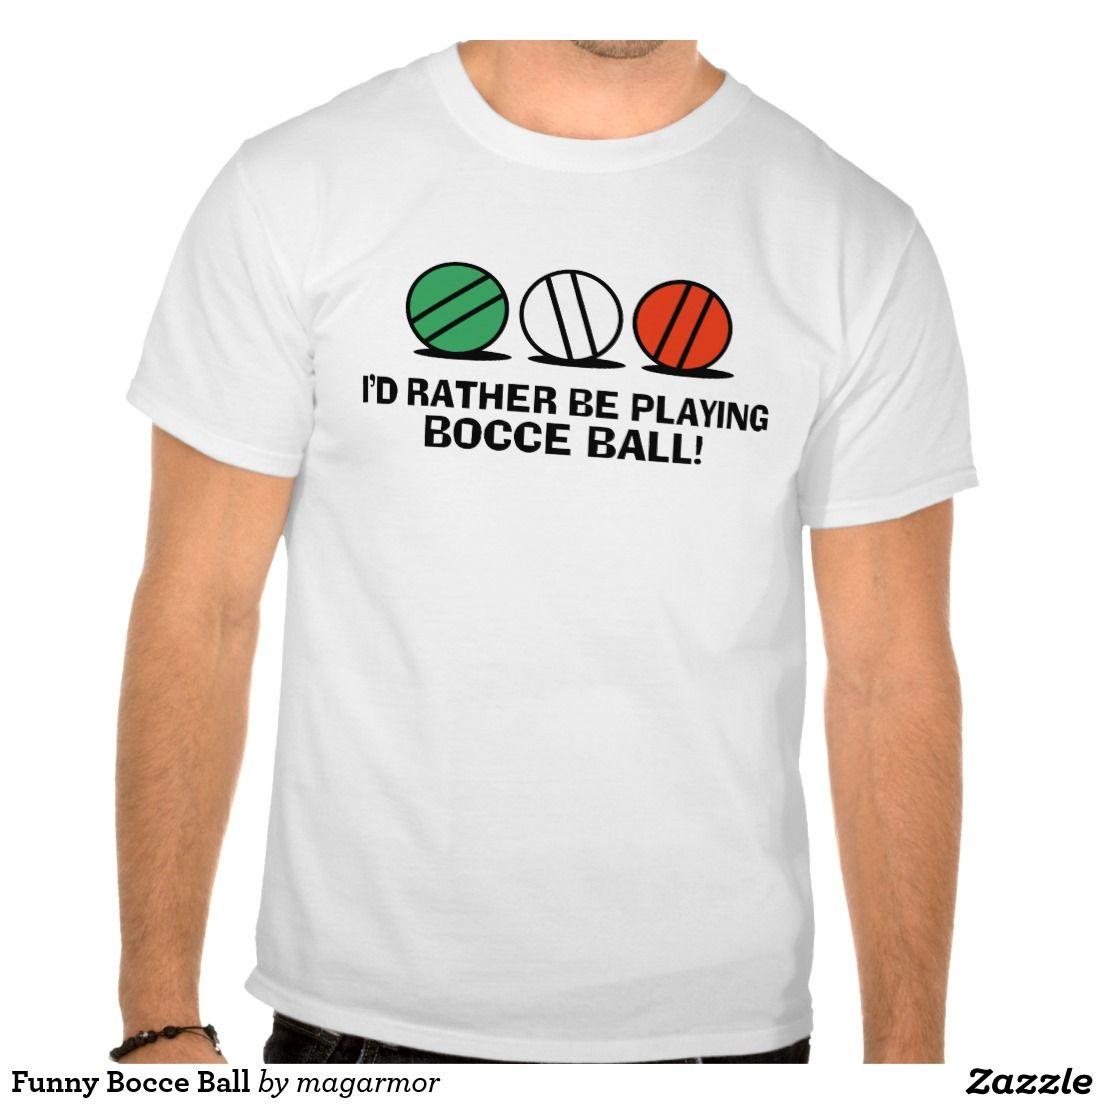 f7554c249 Funny Bocce Ball T-Shirt | Zazzle.com | t-shirt gifts | T shirt ...